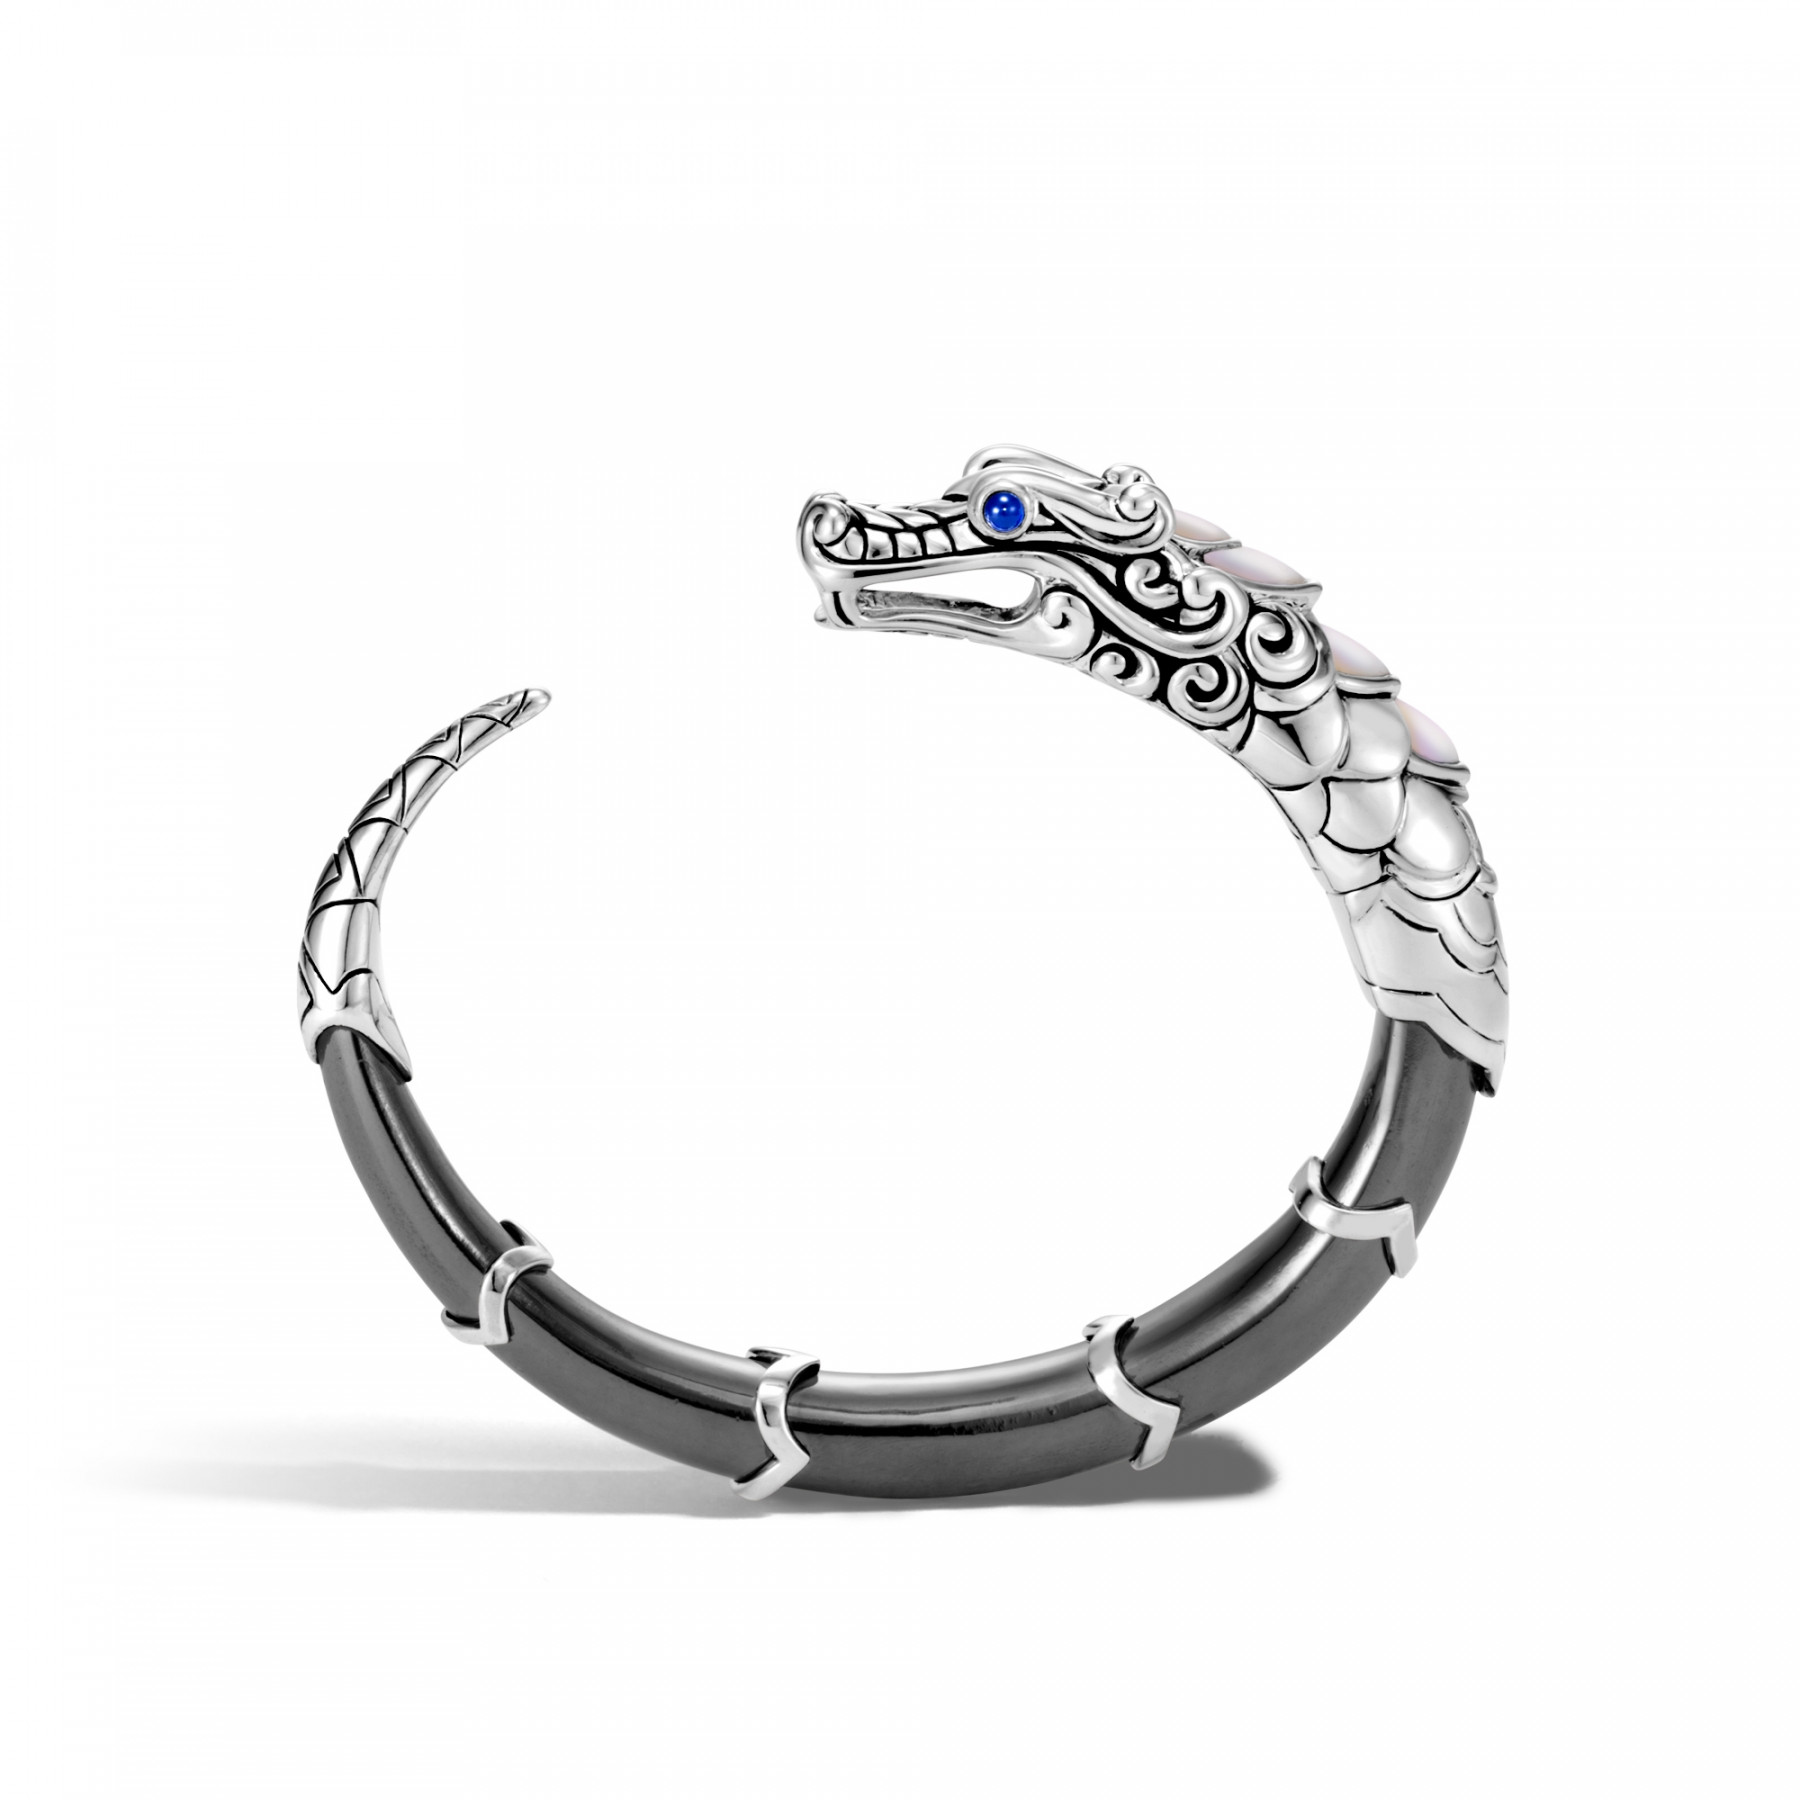 John Hardy Legends Naga Hematite Dragon Cuff Bracelet side view